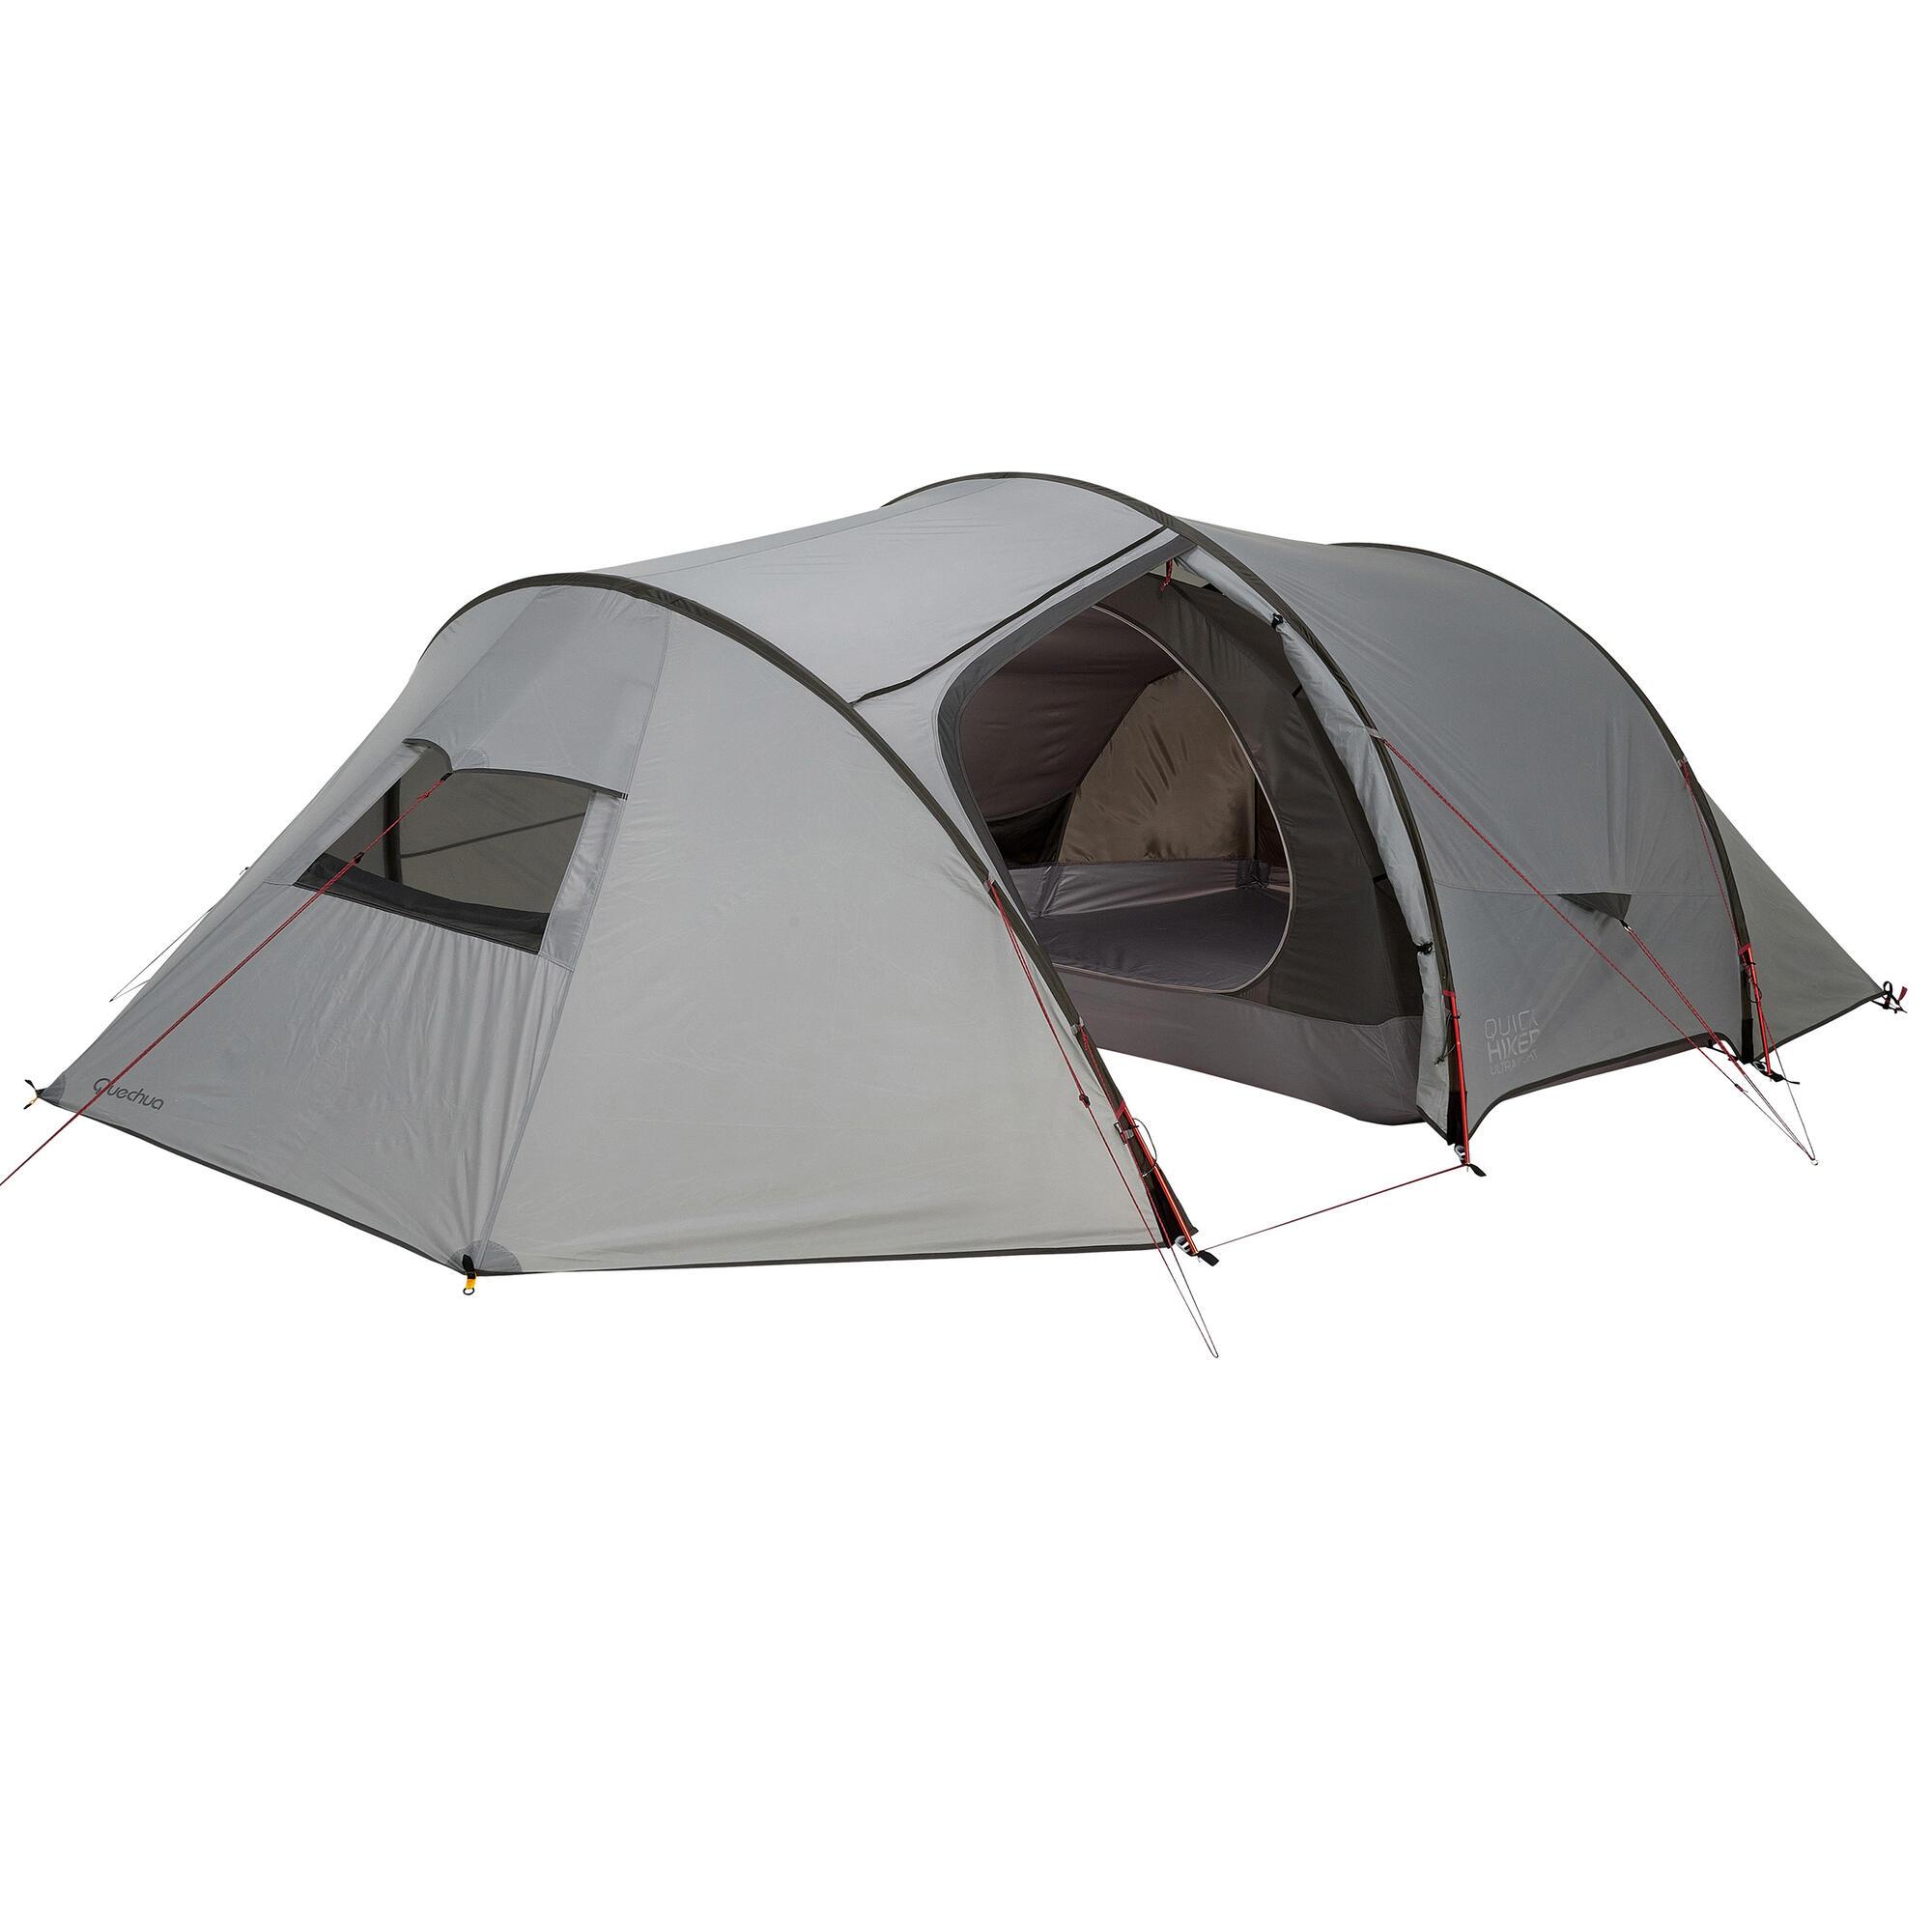 tente de trek quickhiker ultralight 4 personnes gris clair quechua. Black Bedroom Furniture Sets. Home Design Ideas